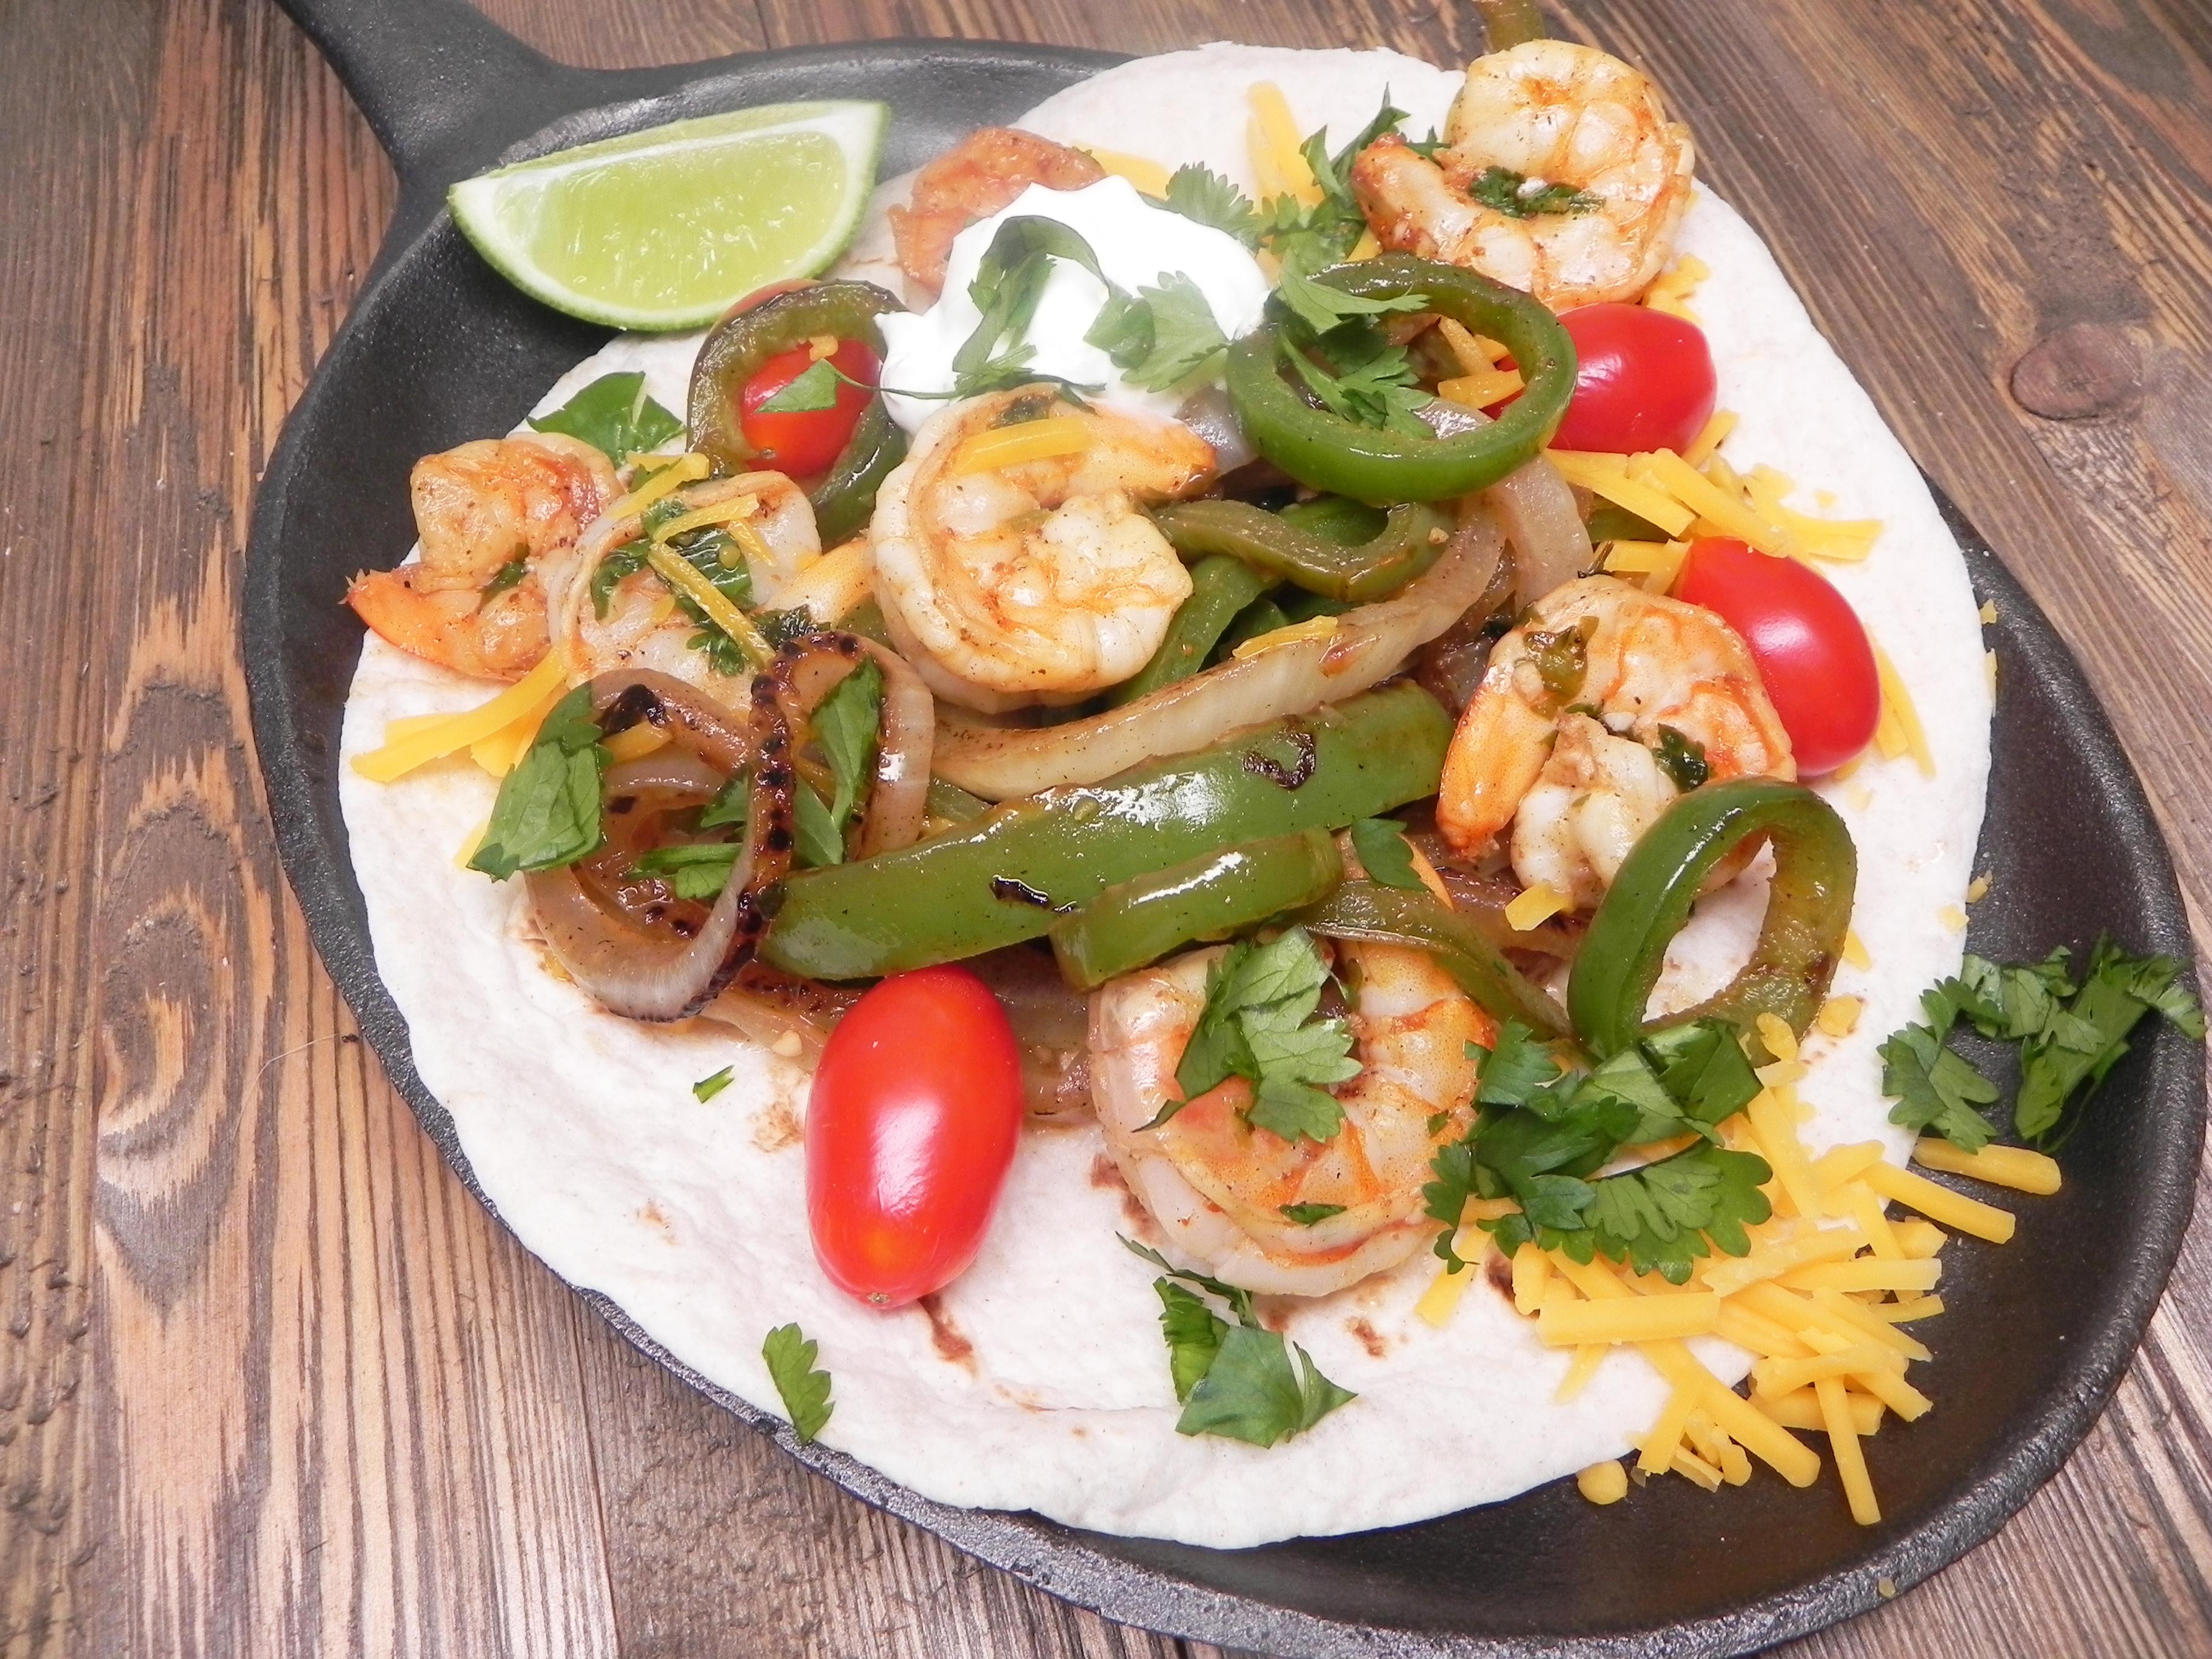 Chili-Lime Shrimp Fajitas